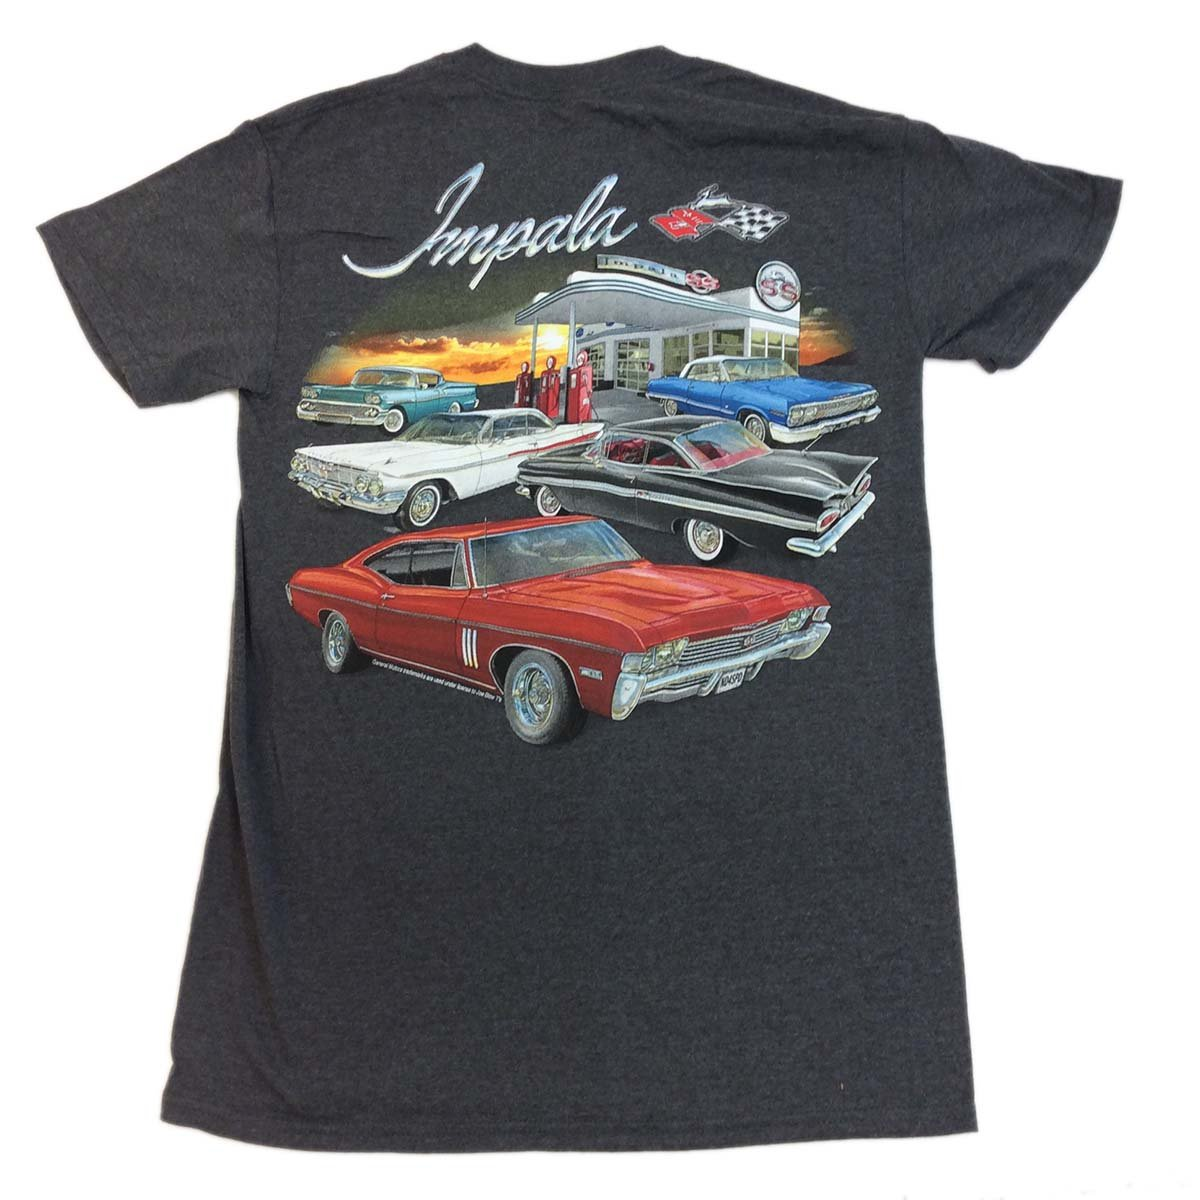 Joe Bloe Tees Mens GM Chevy Impala Gas Station Short Sleeve T-Shirt